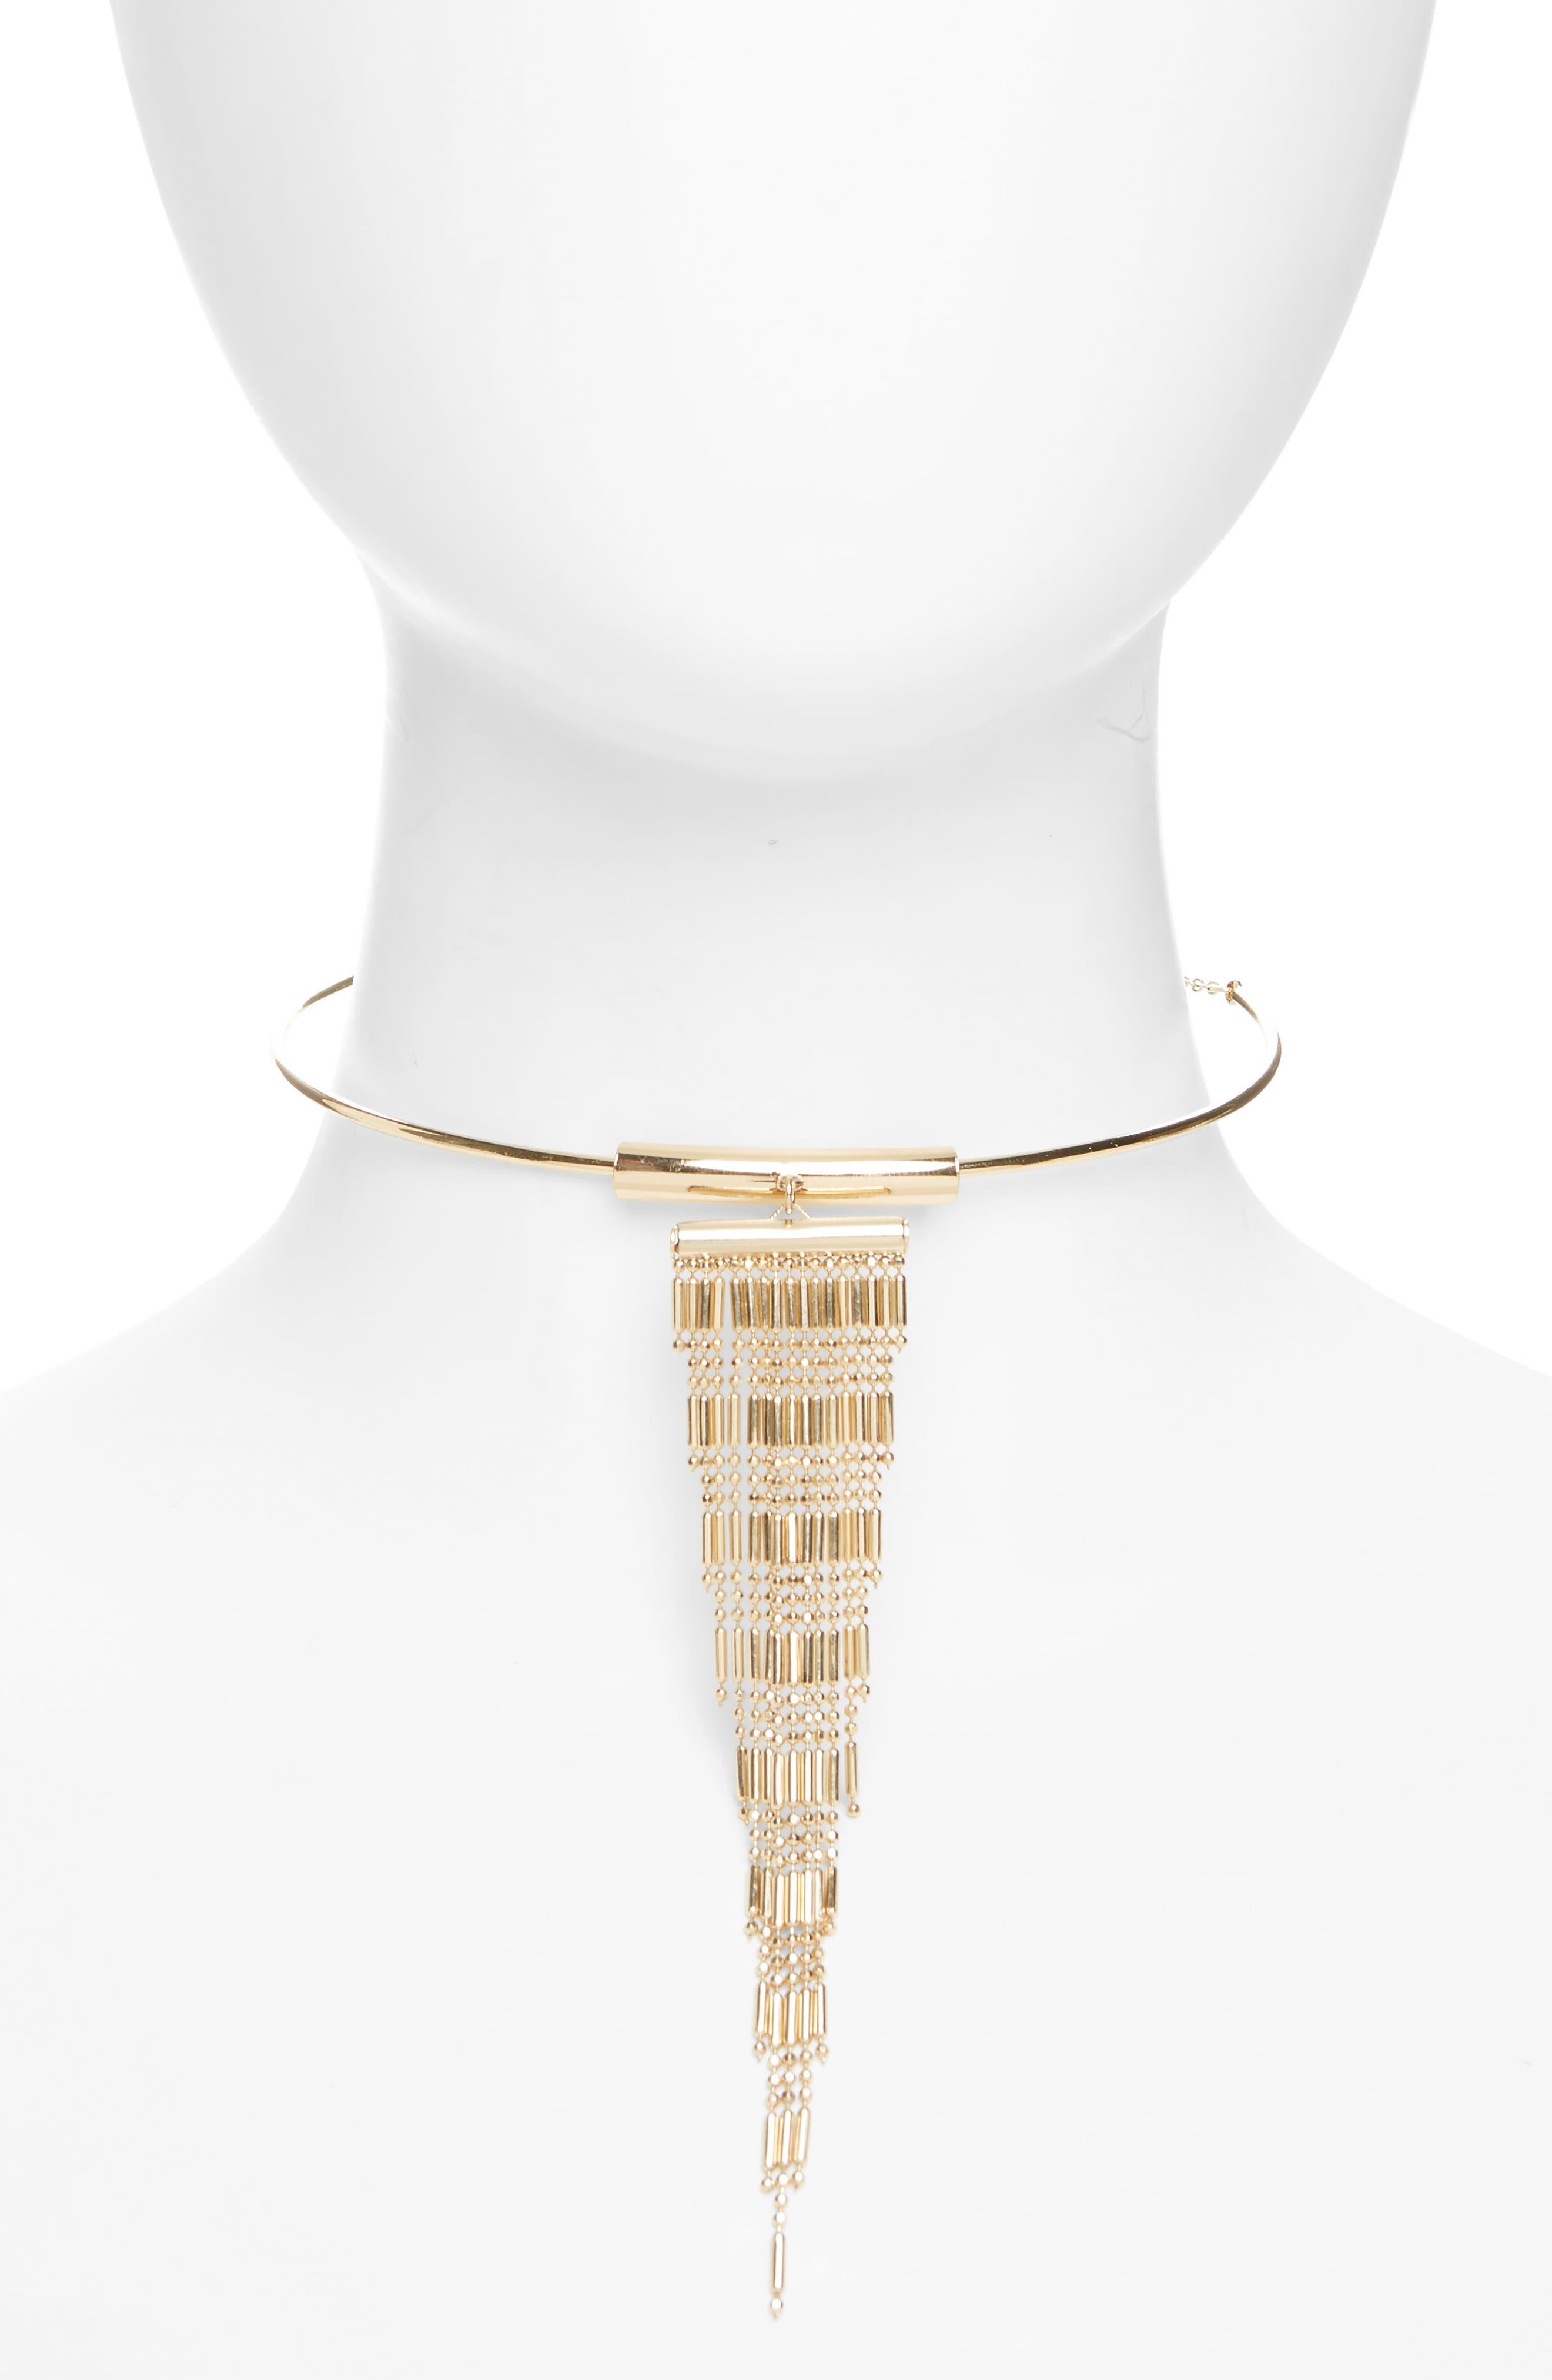 Topshop Tassel Torq Choker Necklace